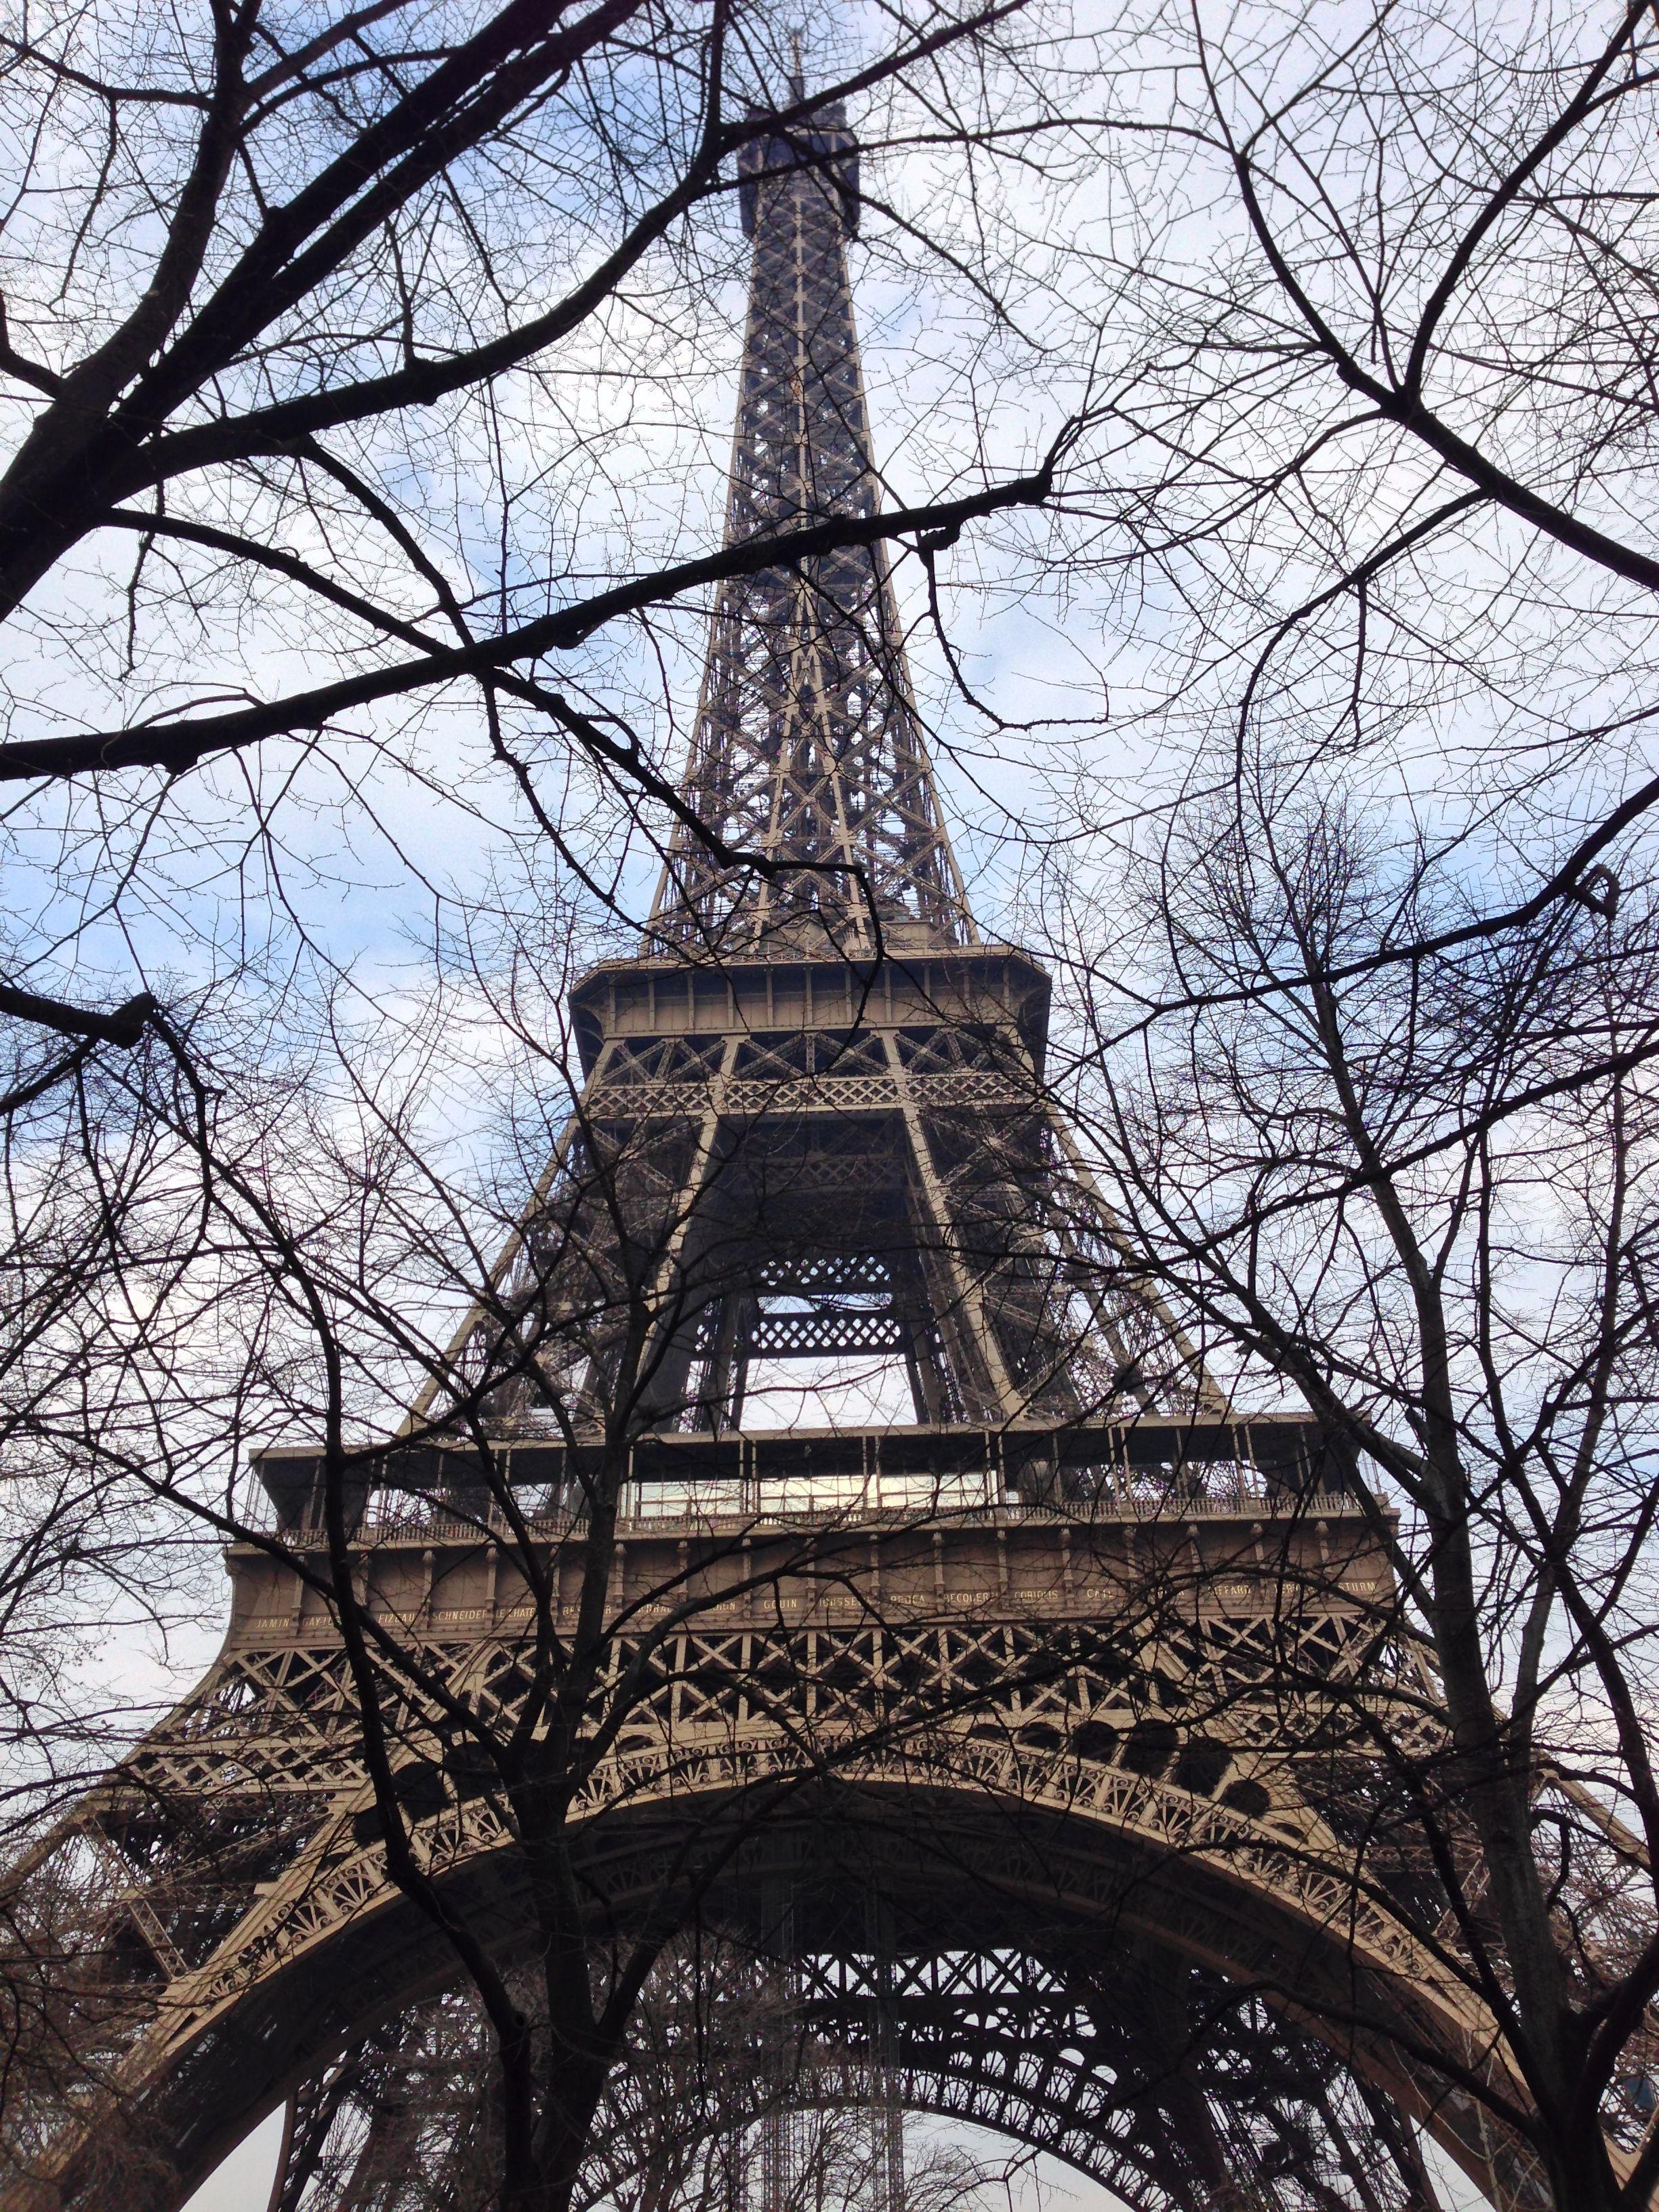 Torre in winter